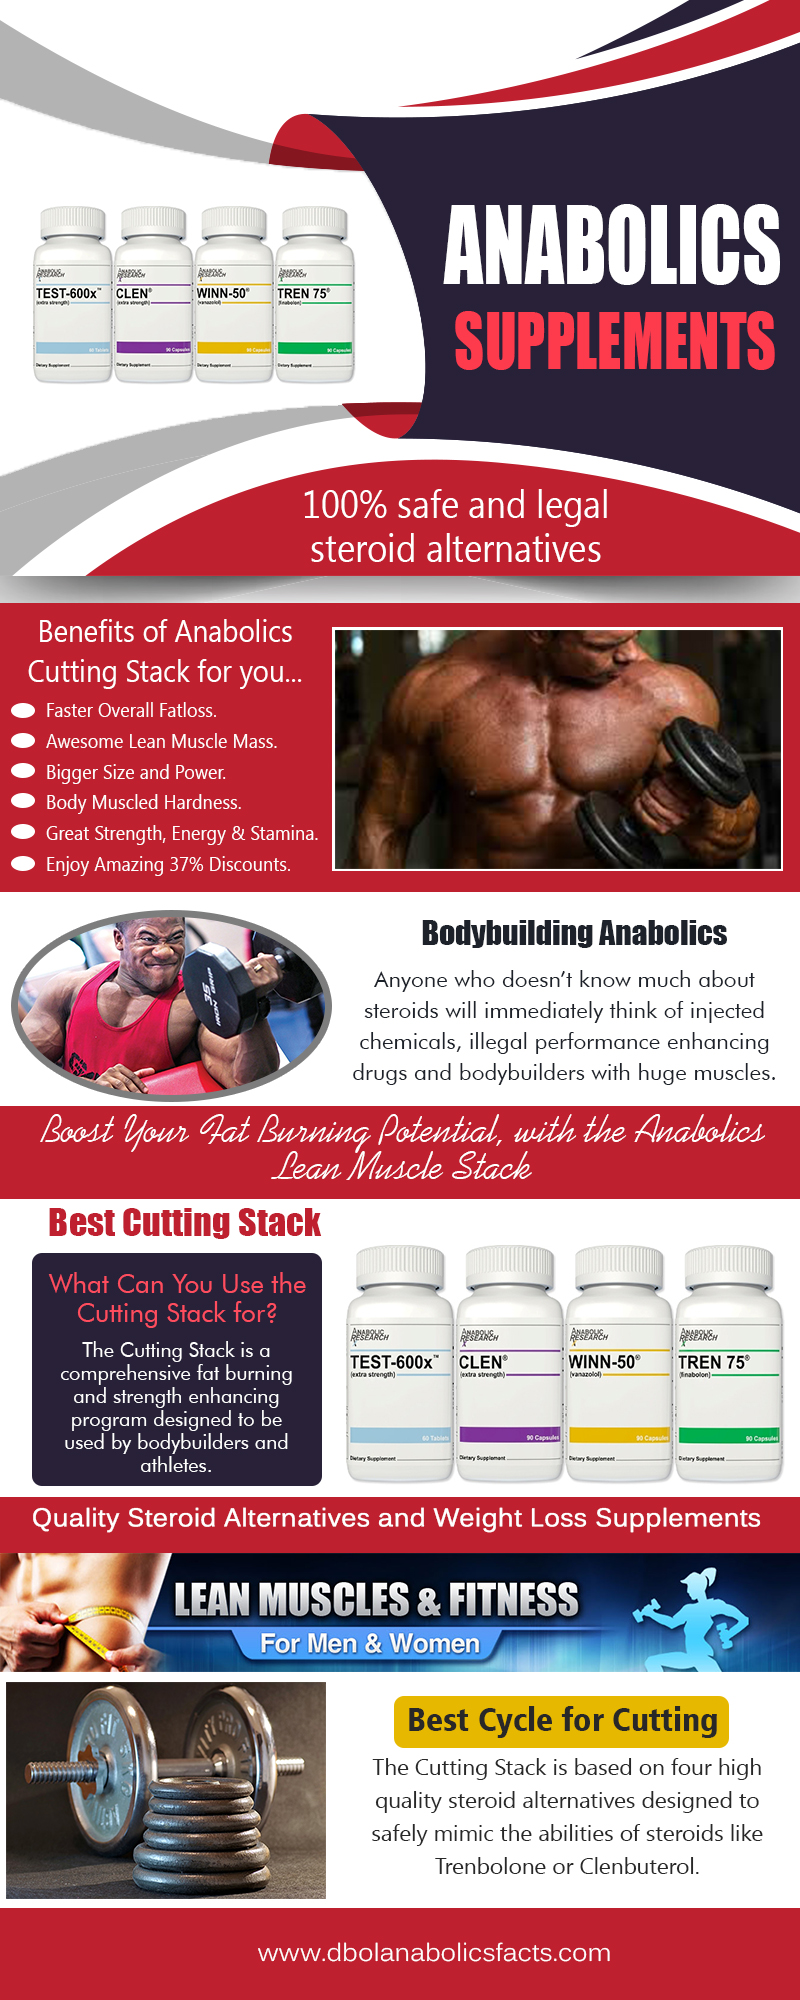 Anabolics Supplement